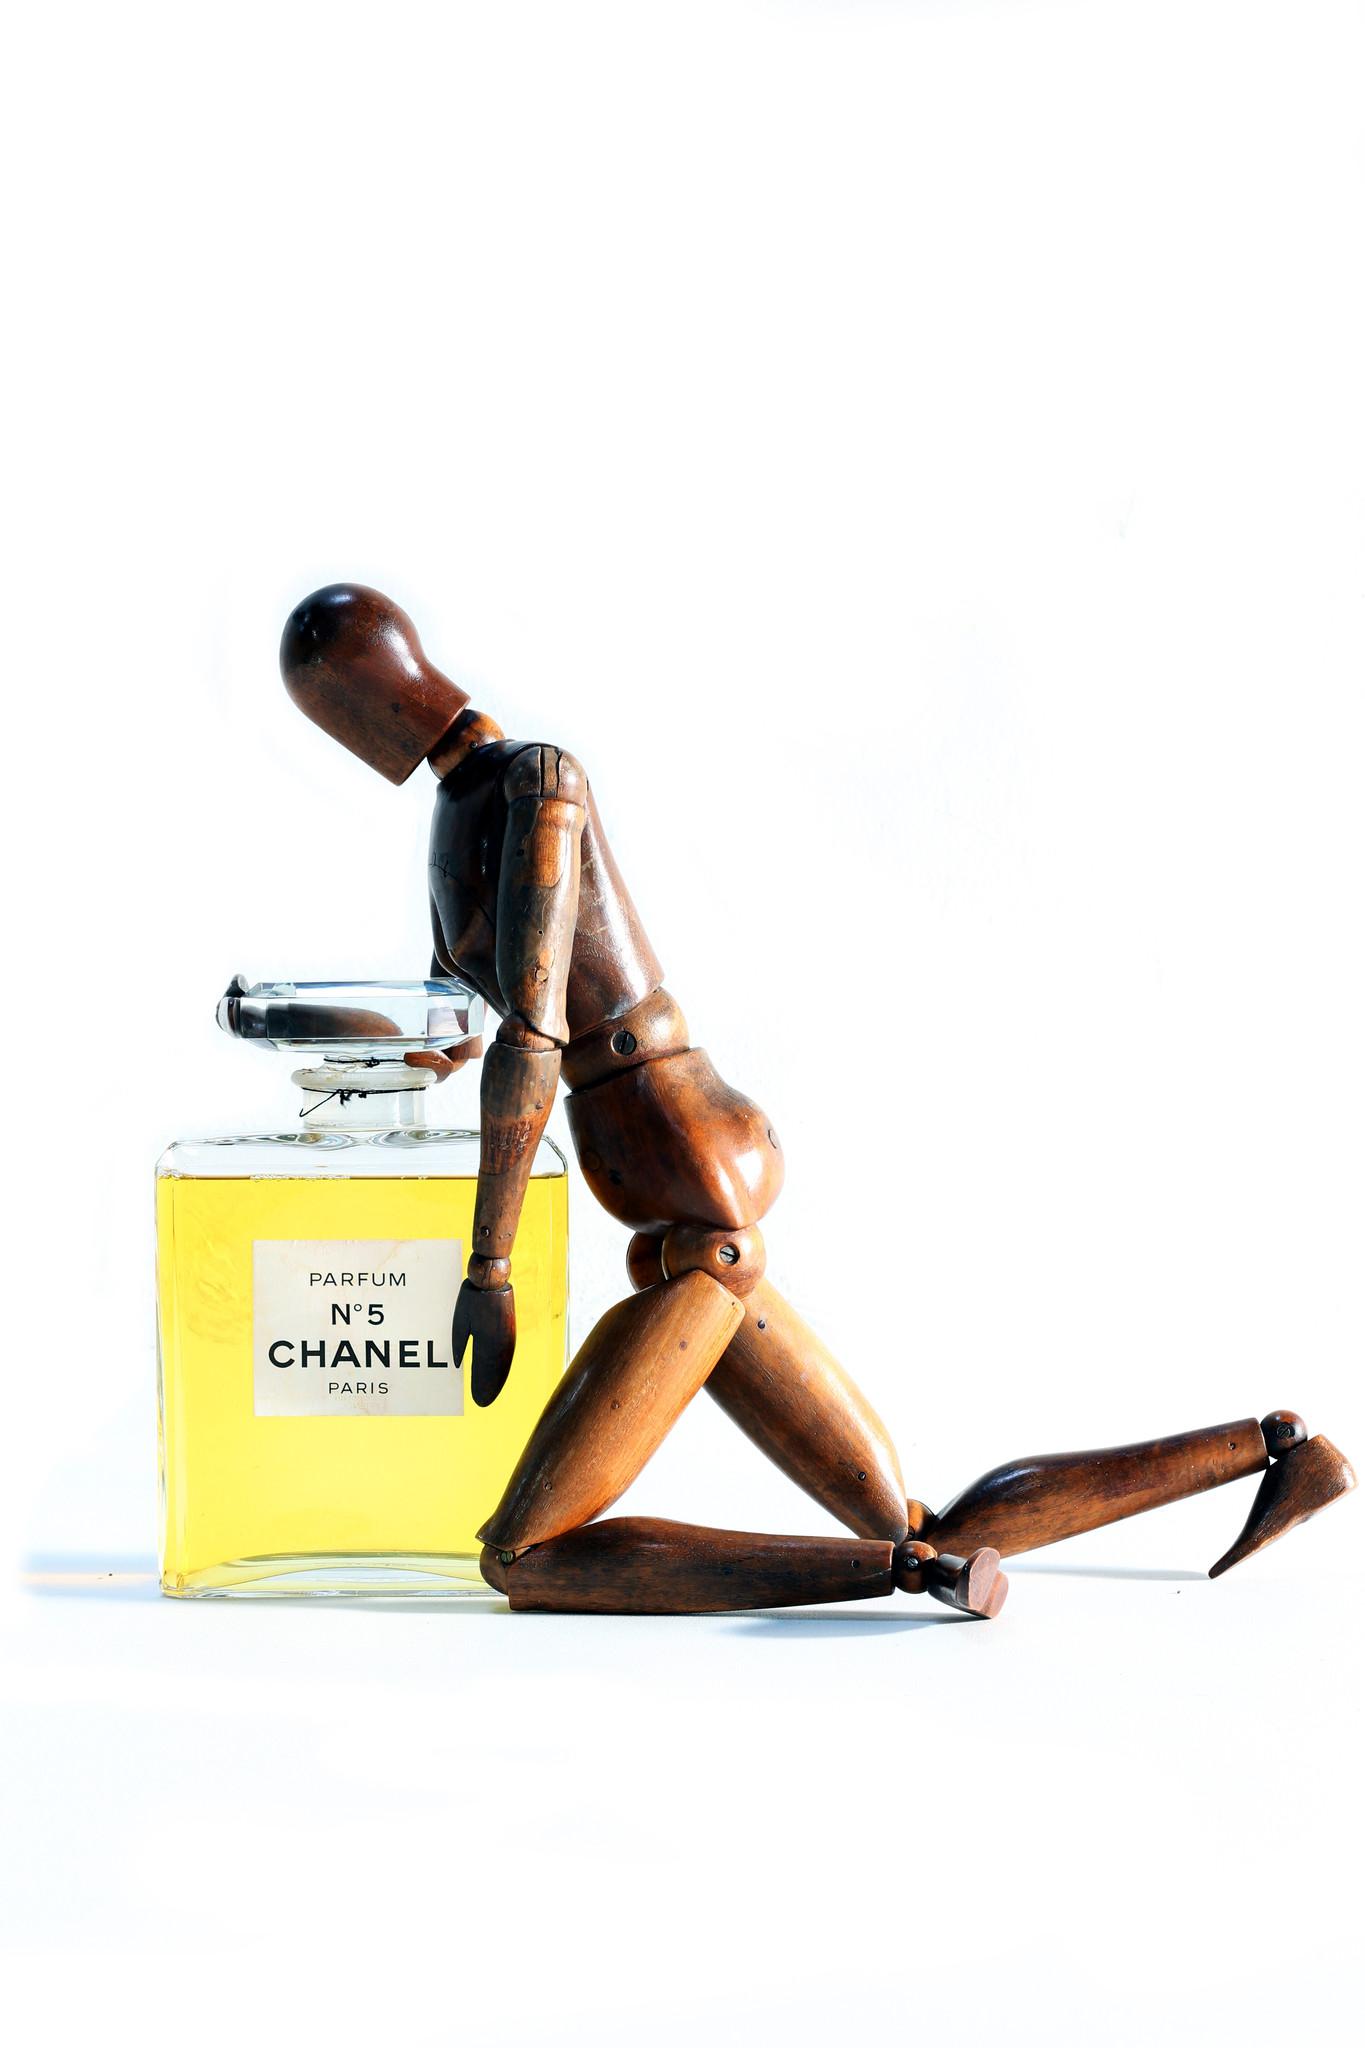 XXL CHANEL n ° 5 Factice dummy